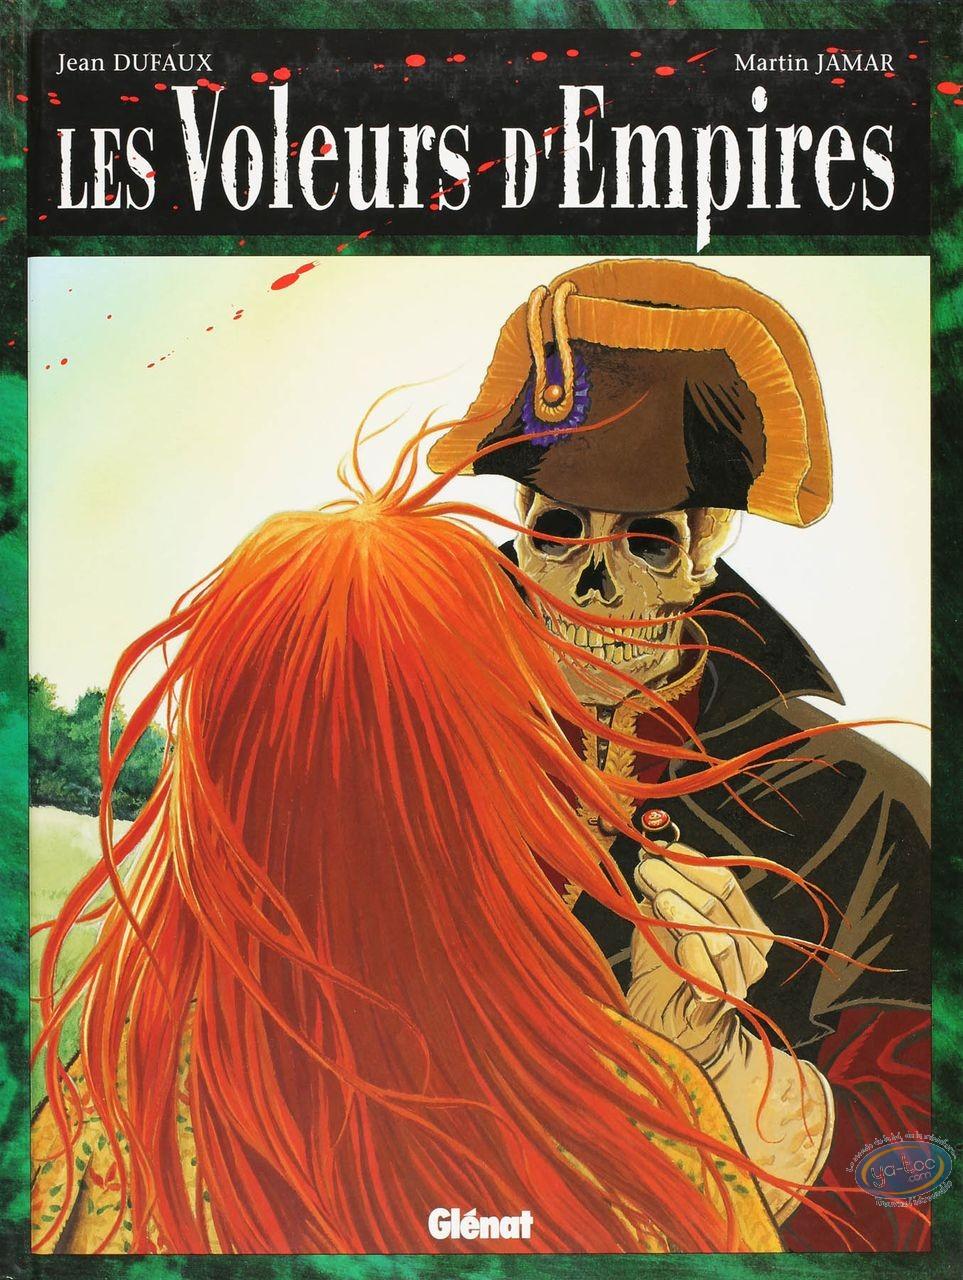 Listed European Comic Books, Voleurs d'Empires (Les) : Les Voleurs d'Empires